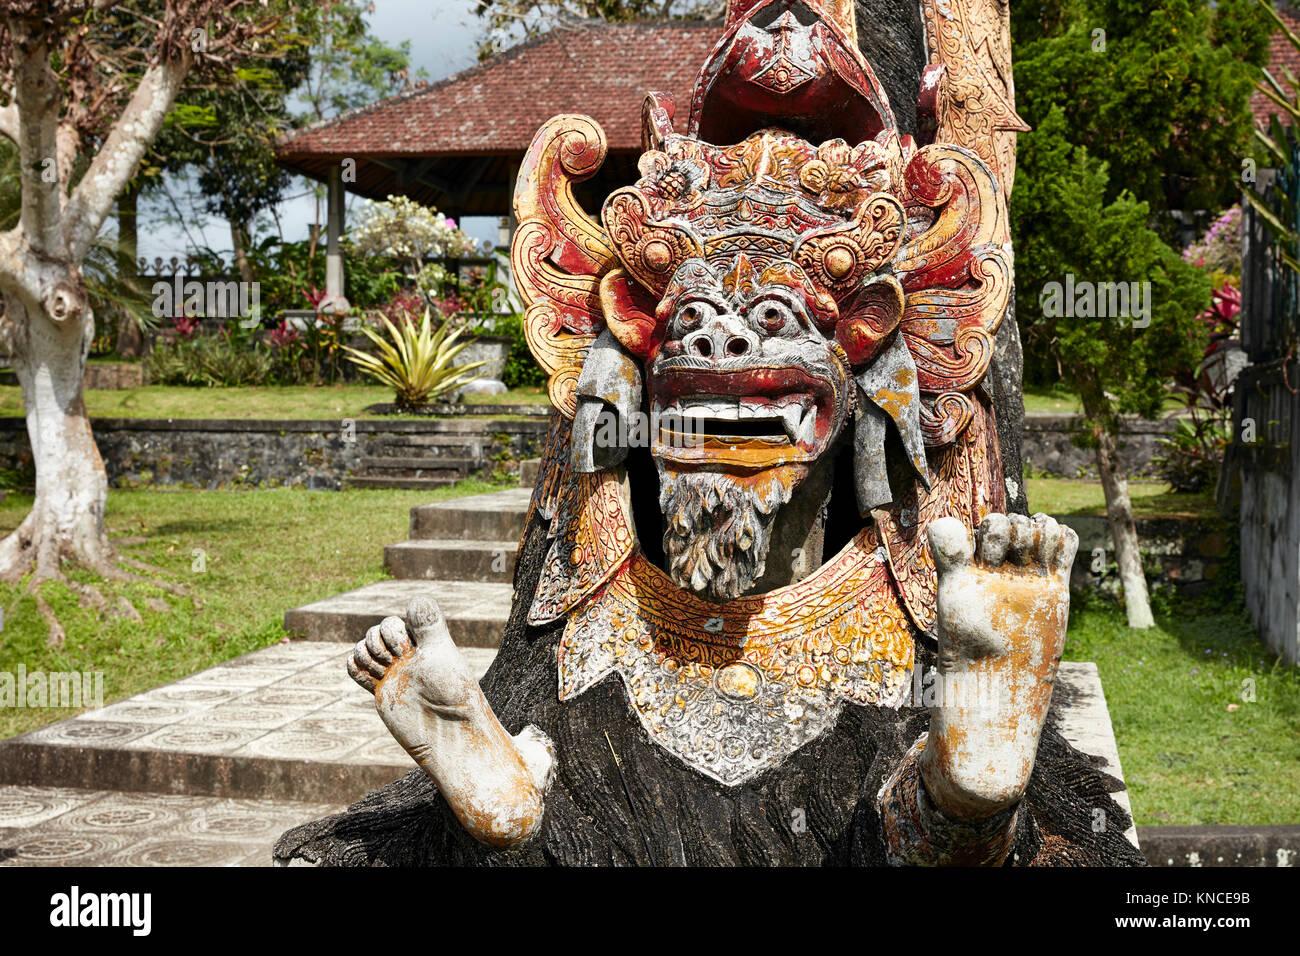 Barong statue in the Tirta Gangga water palace, a former royal palace. Karangasem regency, Bali, Indonesia. - Stock Image